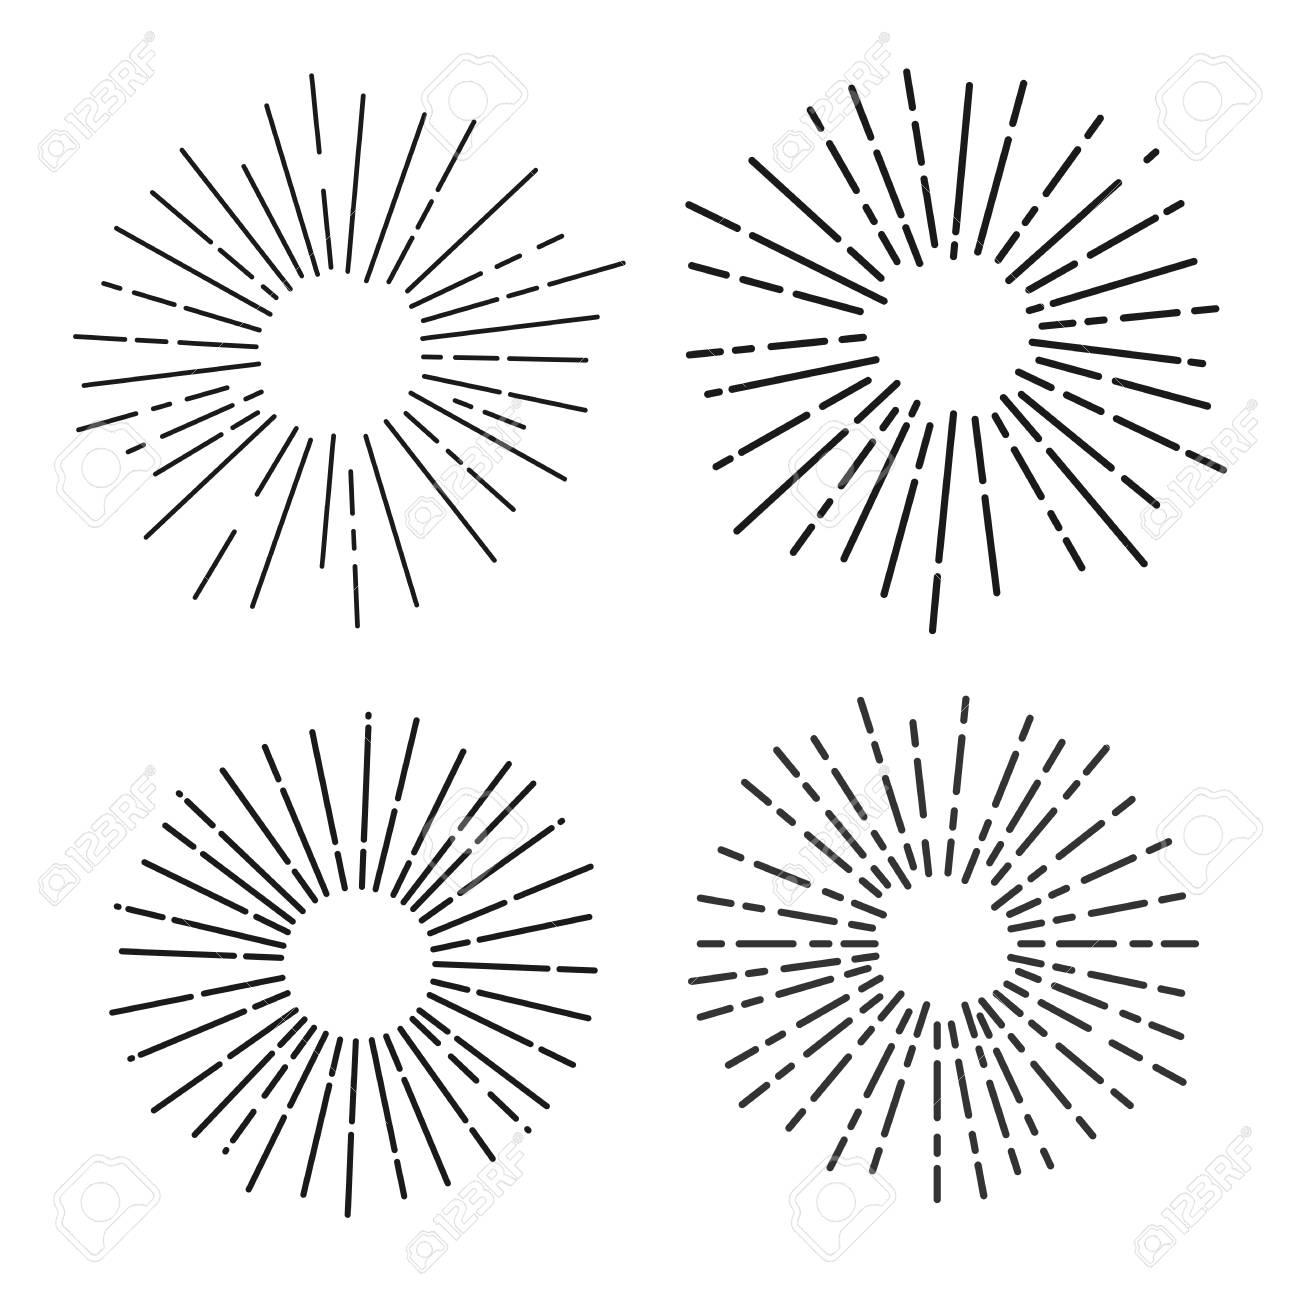 Set of sun rays, fireworks, linear drawing vector illustrator